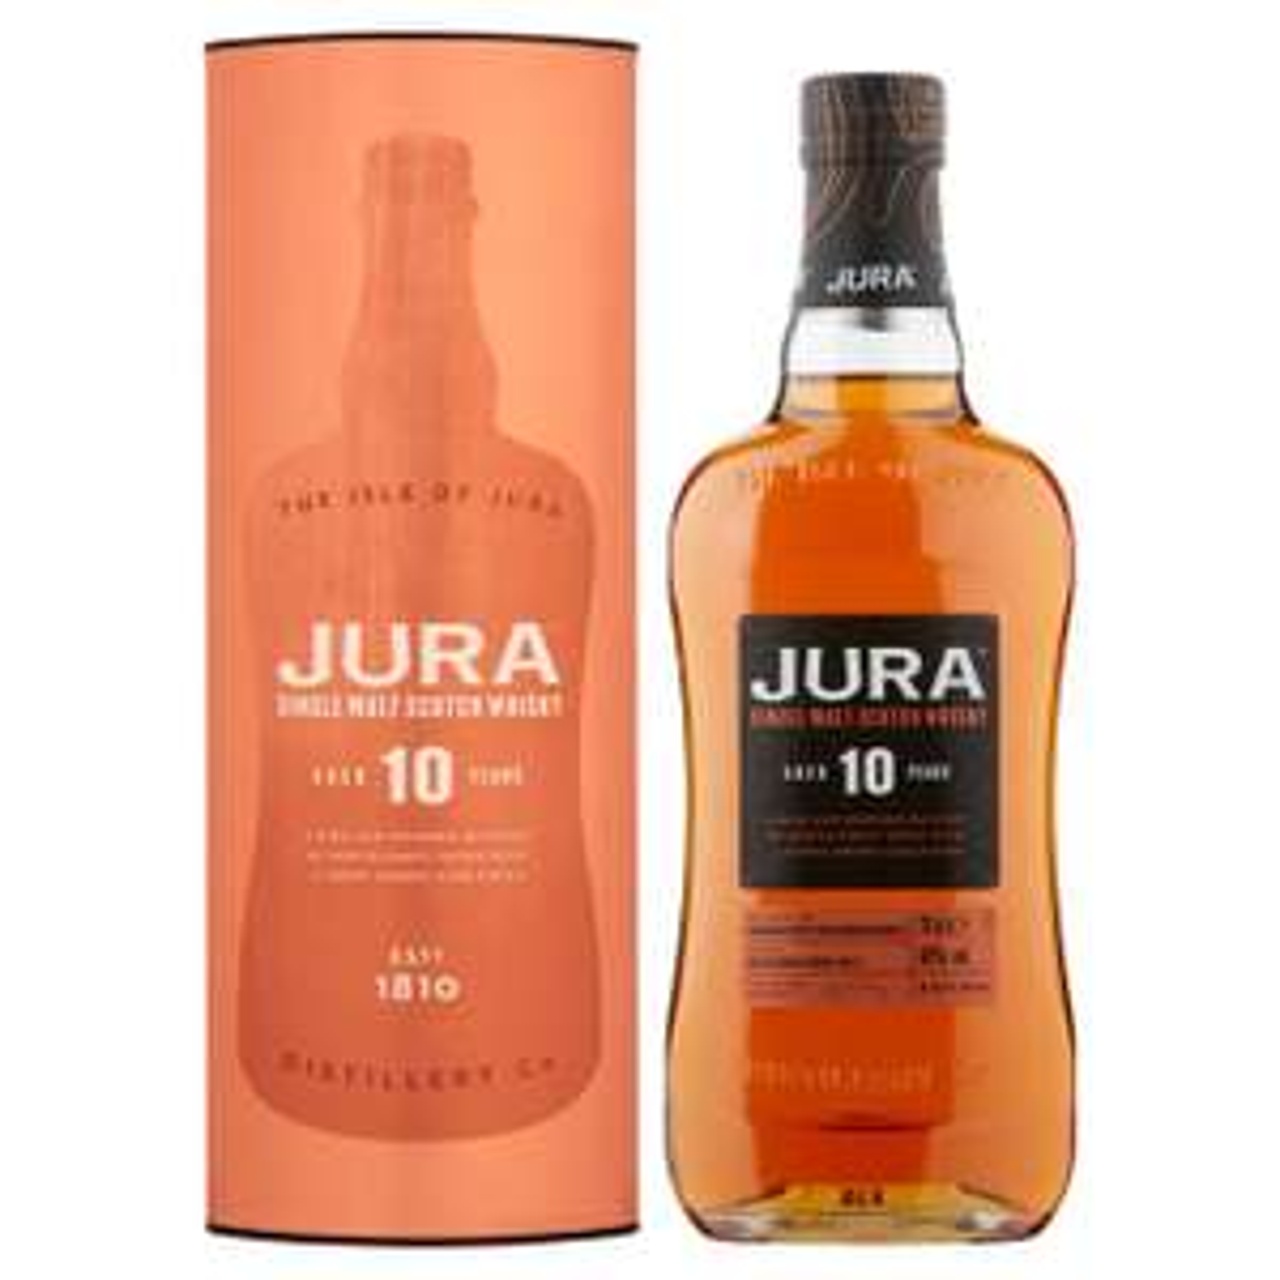 Jura Aged 10 Years Single Malt Scotch Whisky (Abv 40%) 70cl @ Morrisons